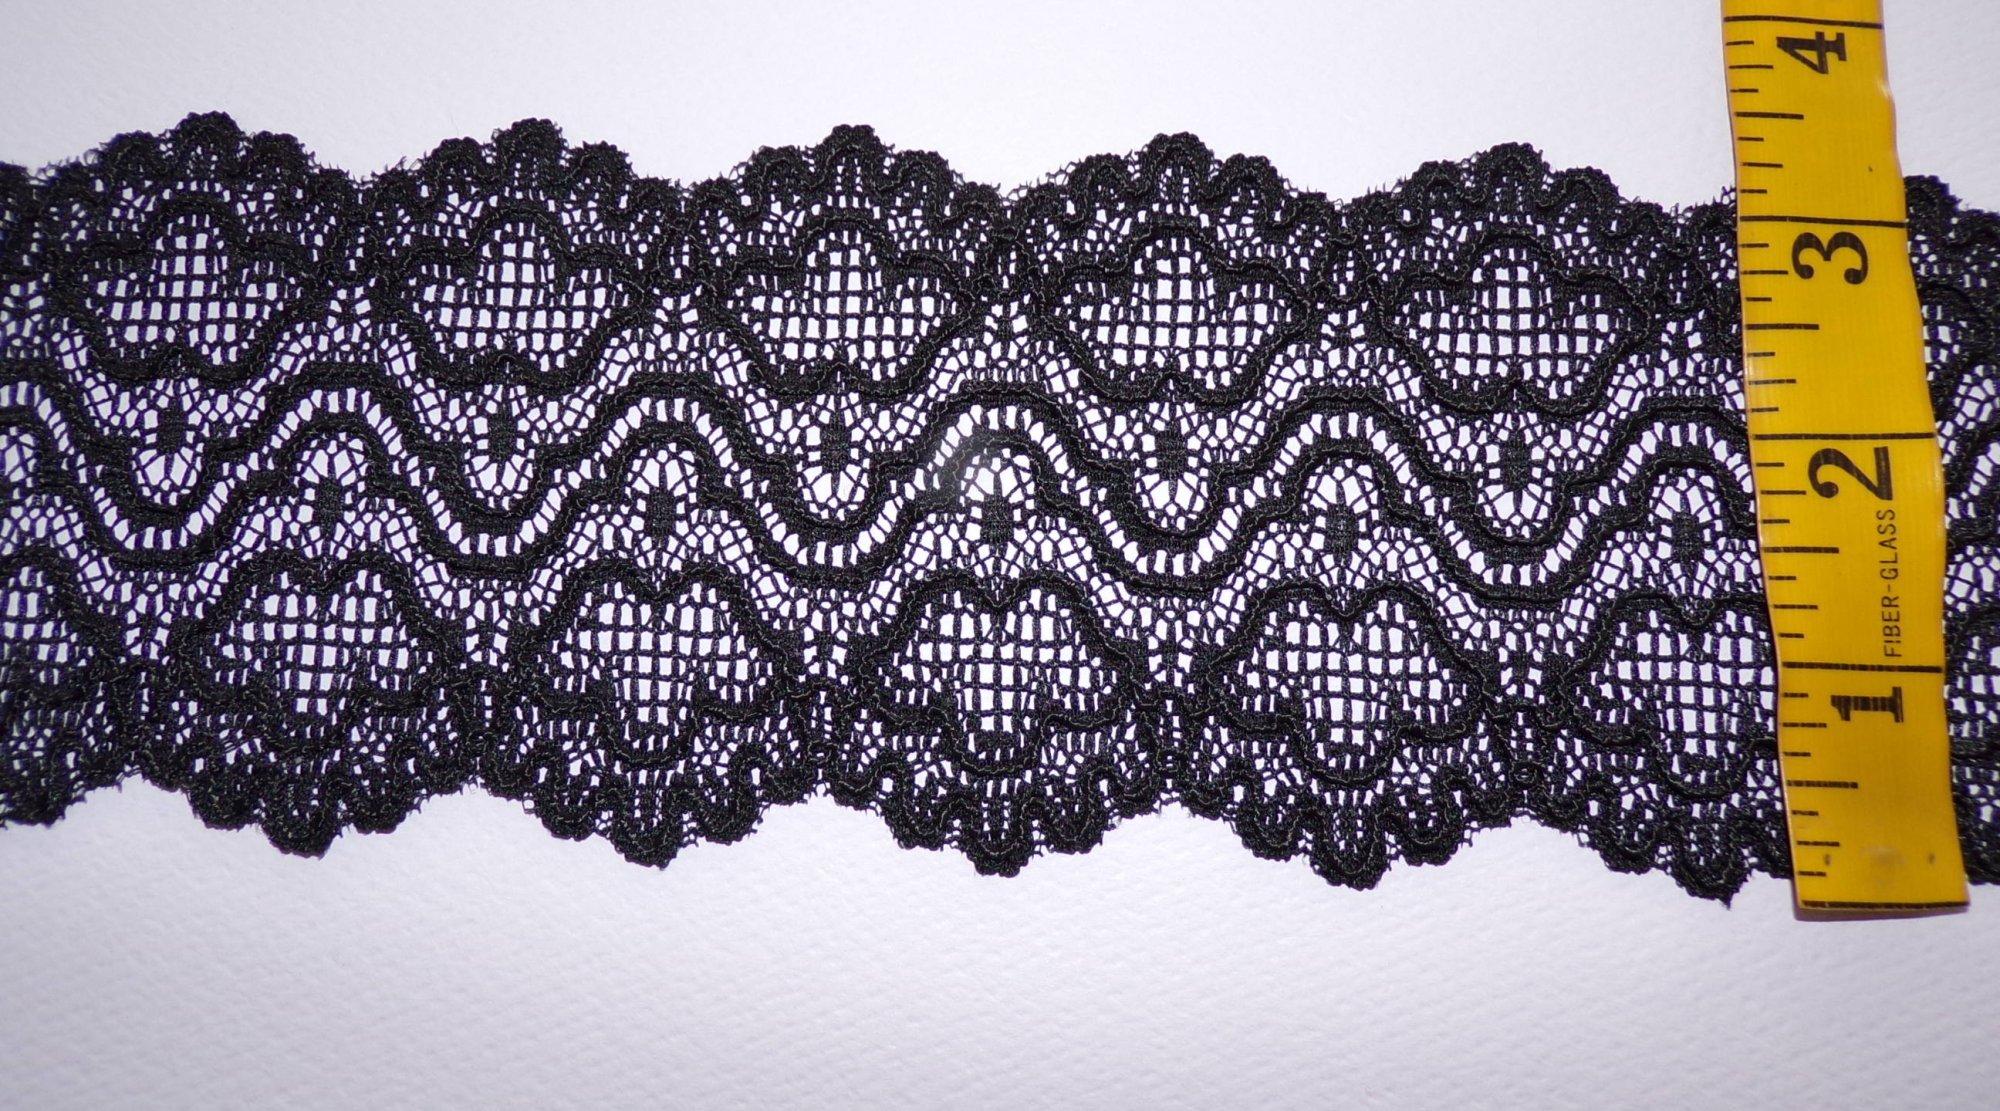 3 Re-Embroidered Black Rigid Lace - MF-254